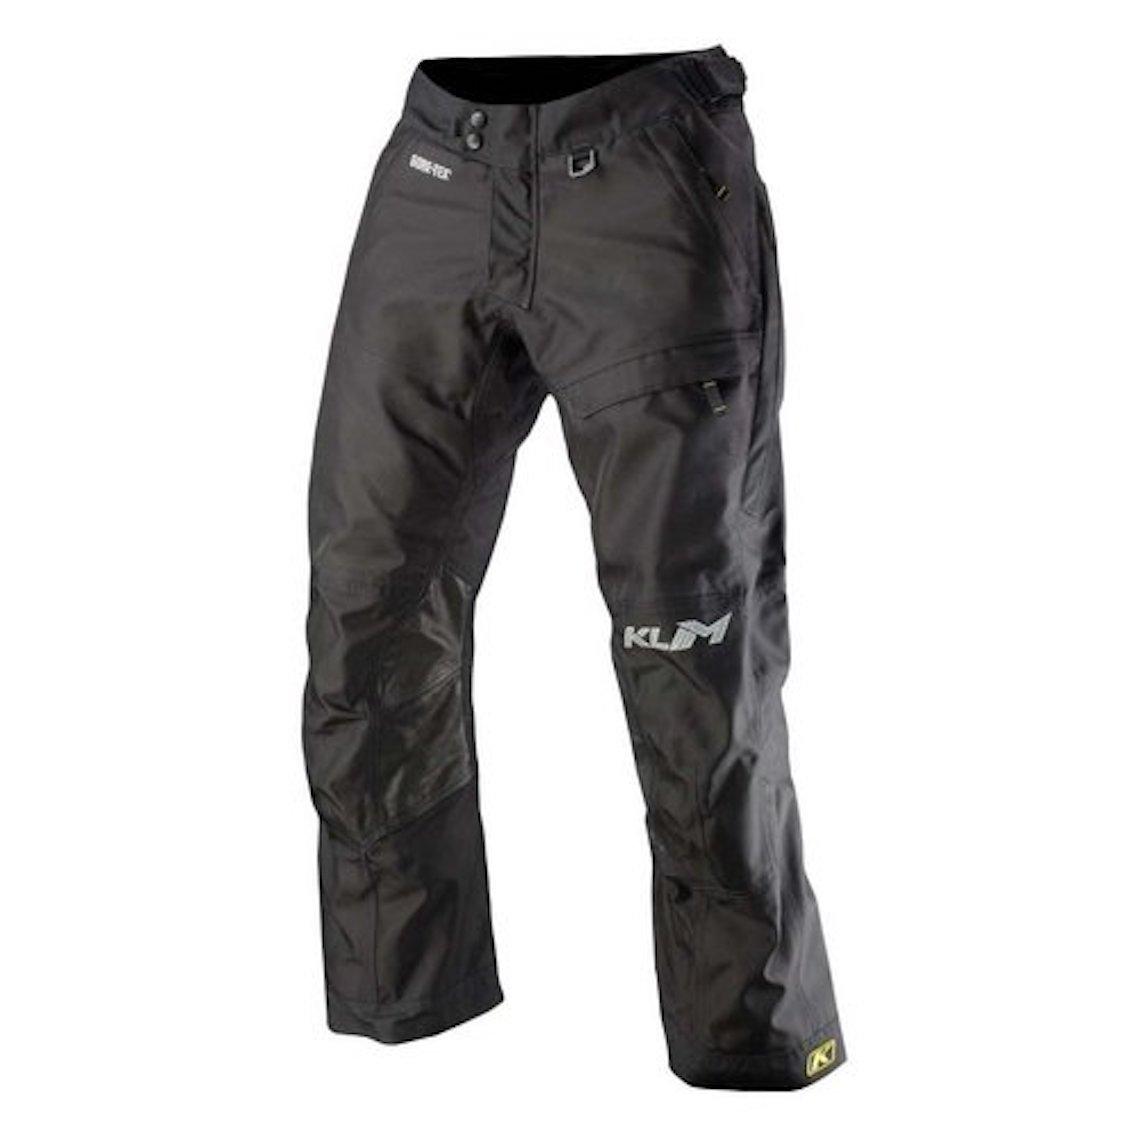 klim trousers